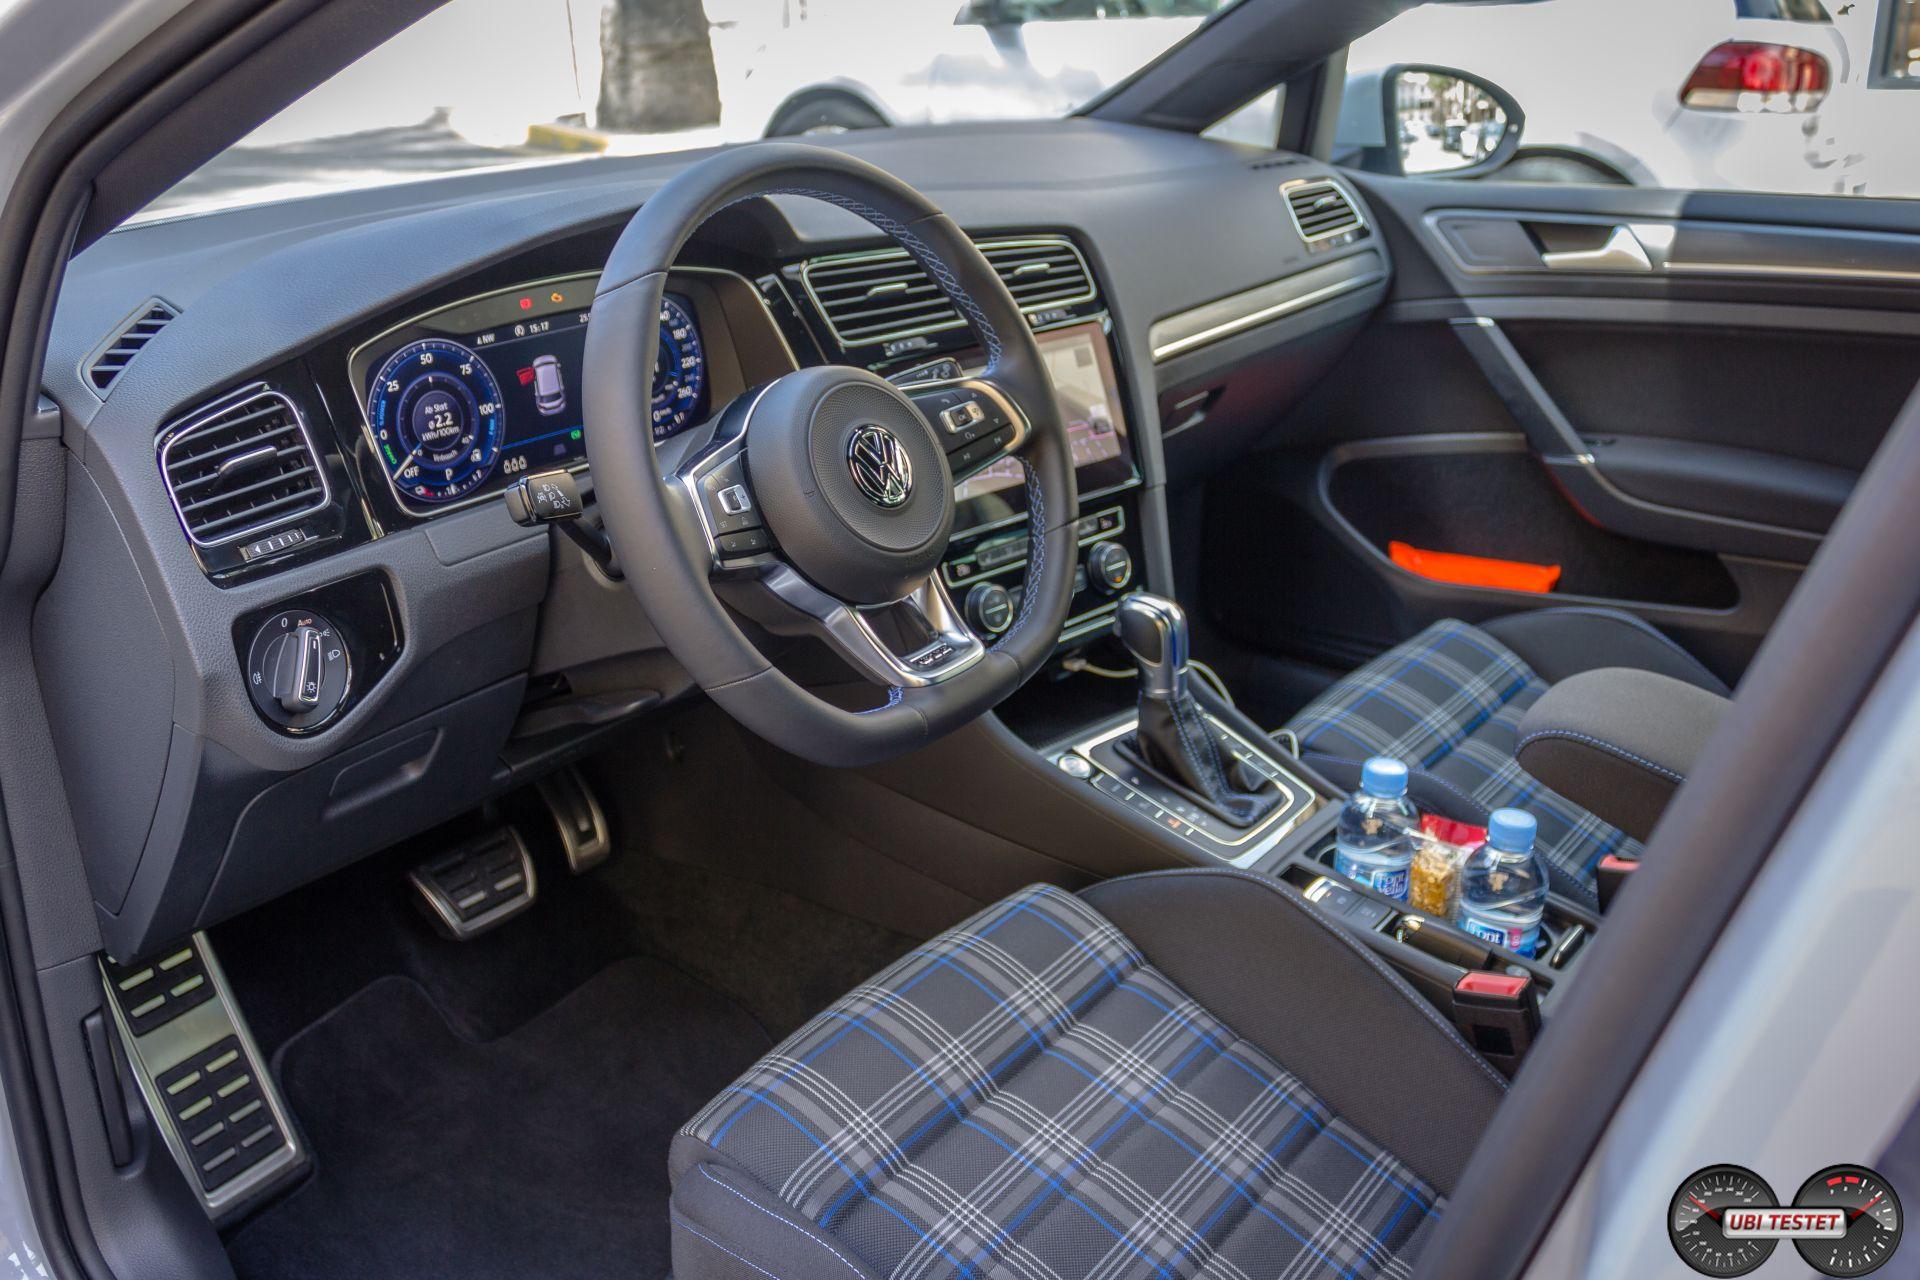 VW Golf GTE Innenraum active Info Display 2017